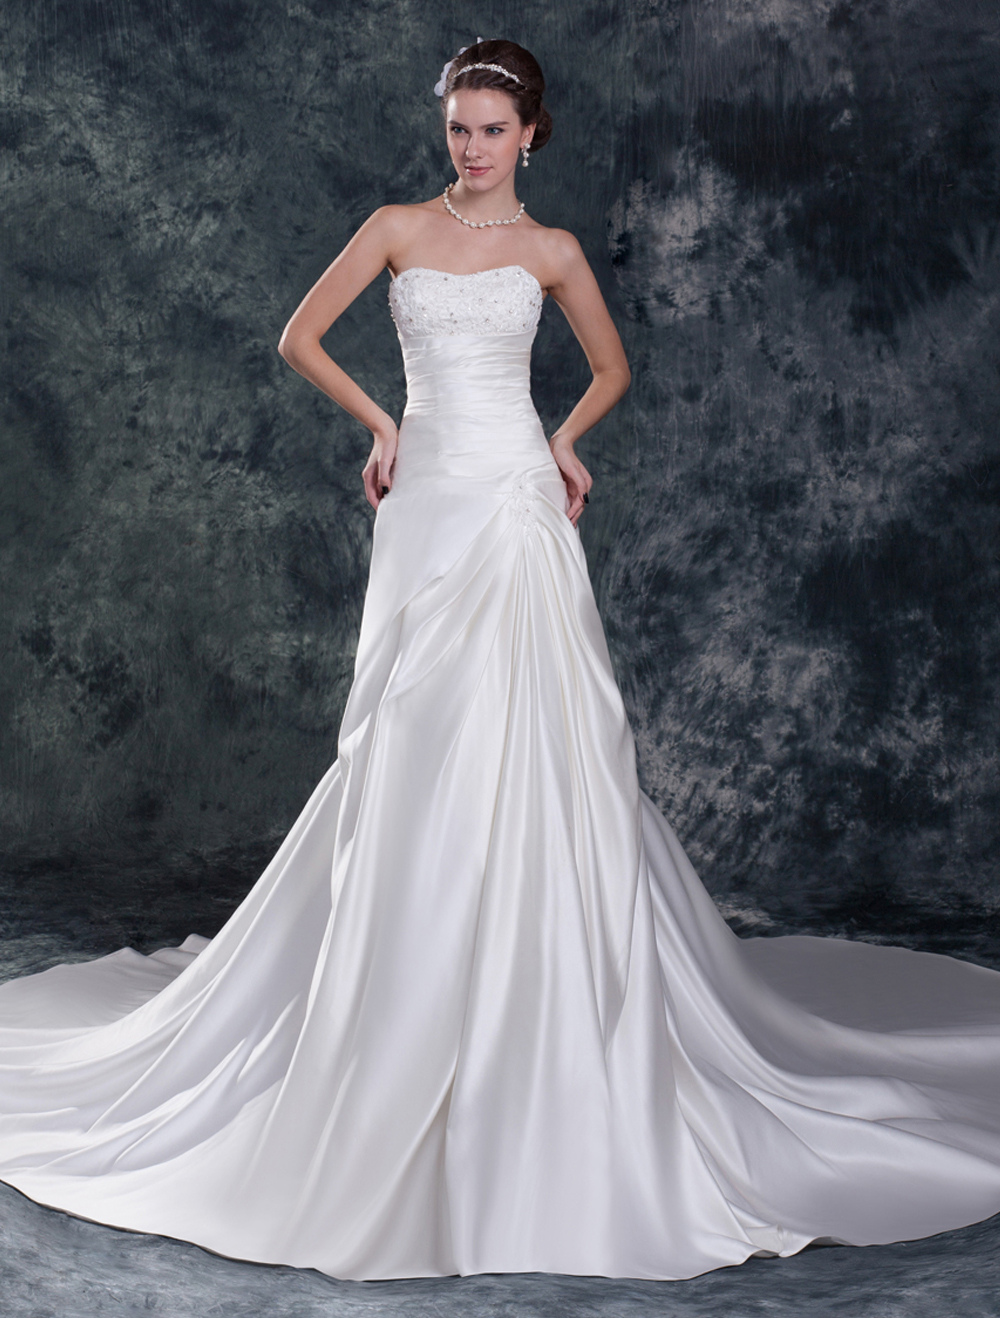 White Sweetheart Beading Satin Wedding Dress For Bride photo